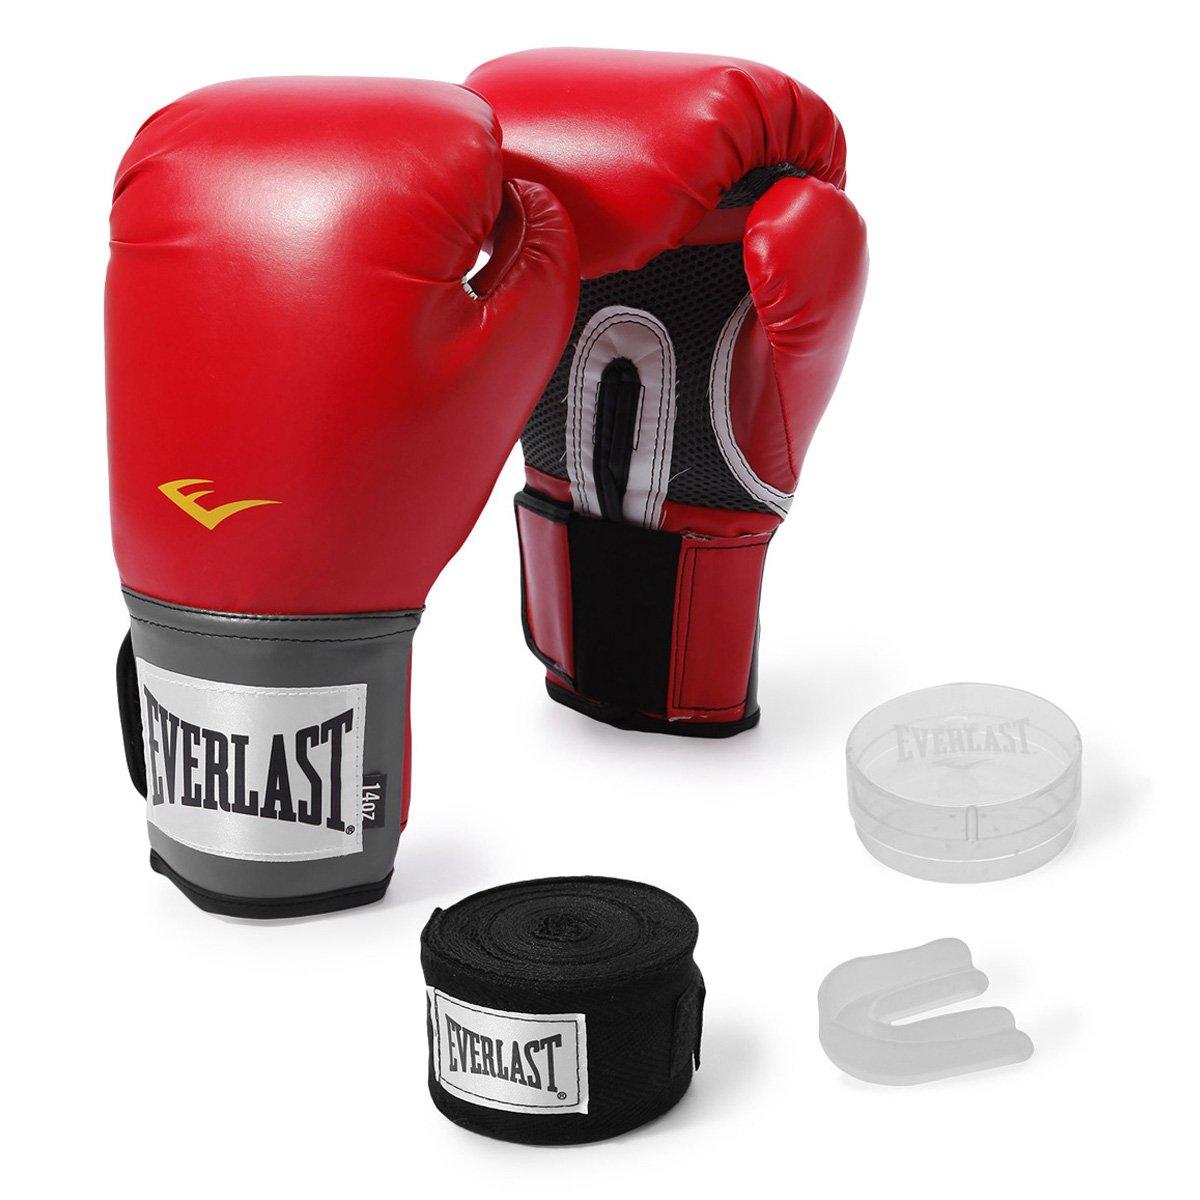 73df04628 Kit Luva de Boxe Everlast Training 12 Oz + Bandagem